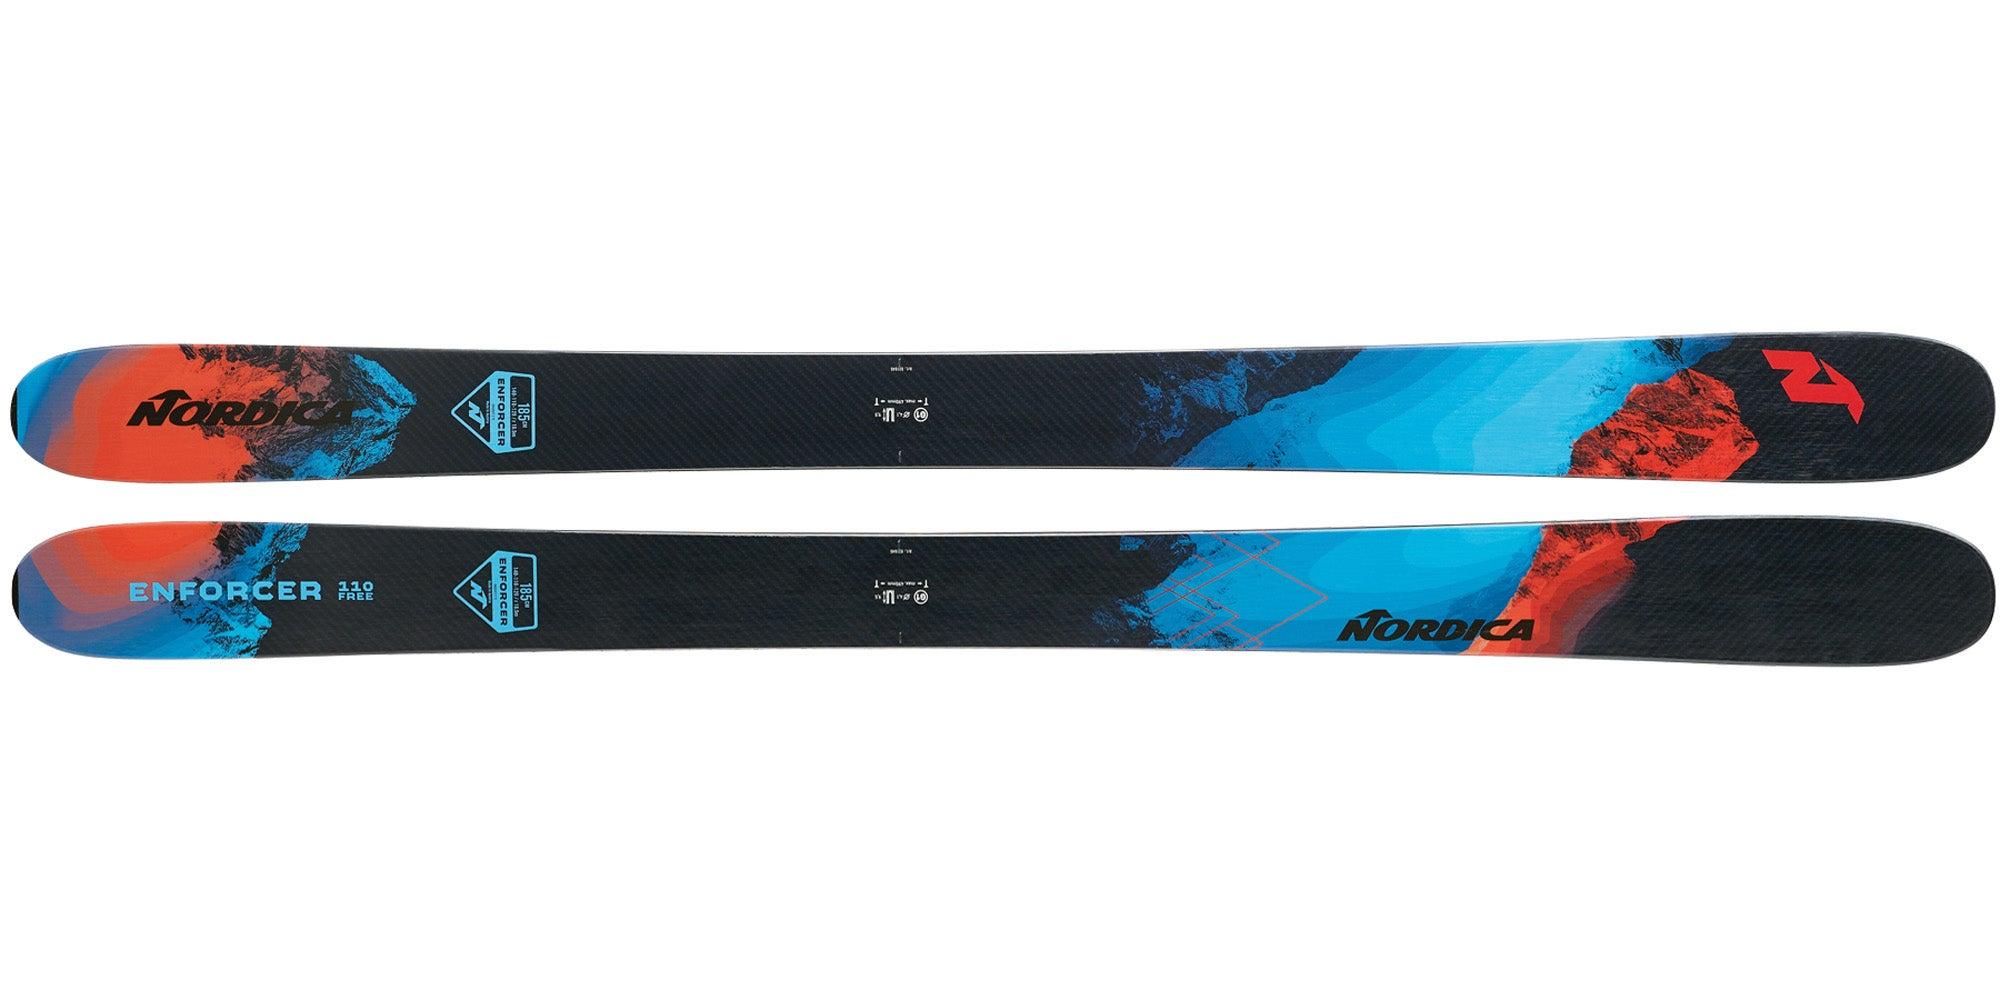 2021 Nordica Enforcer 110 Free Men's Deep Snow Ski